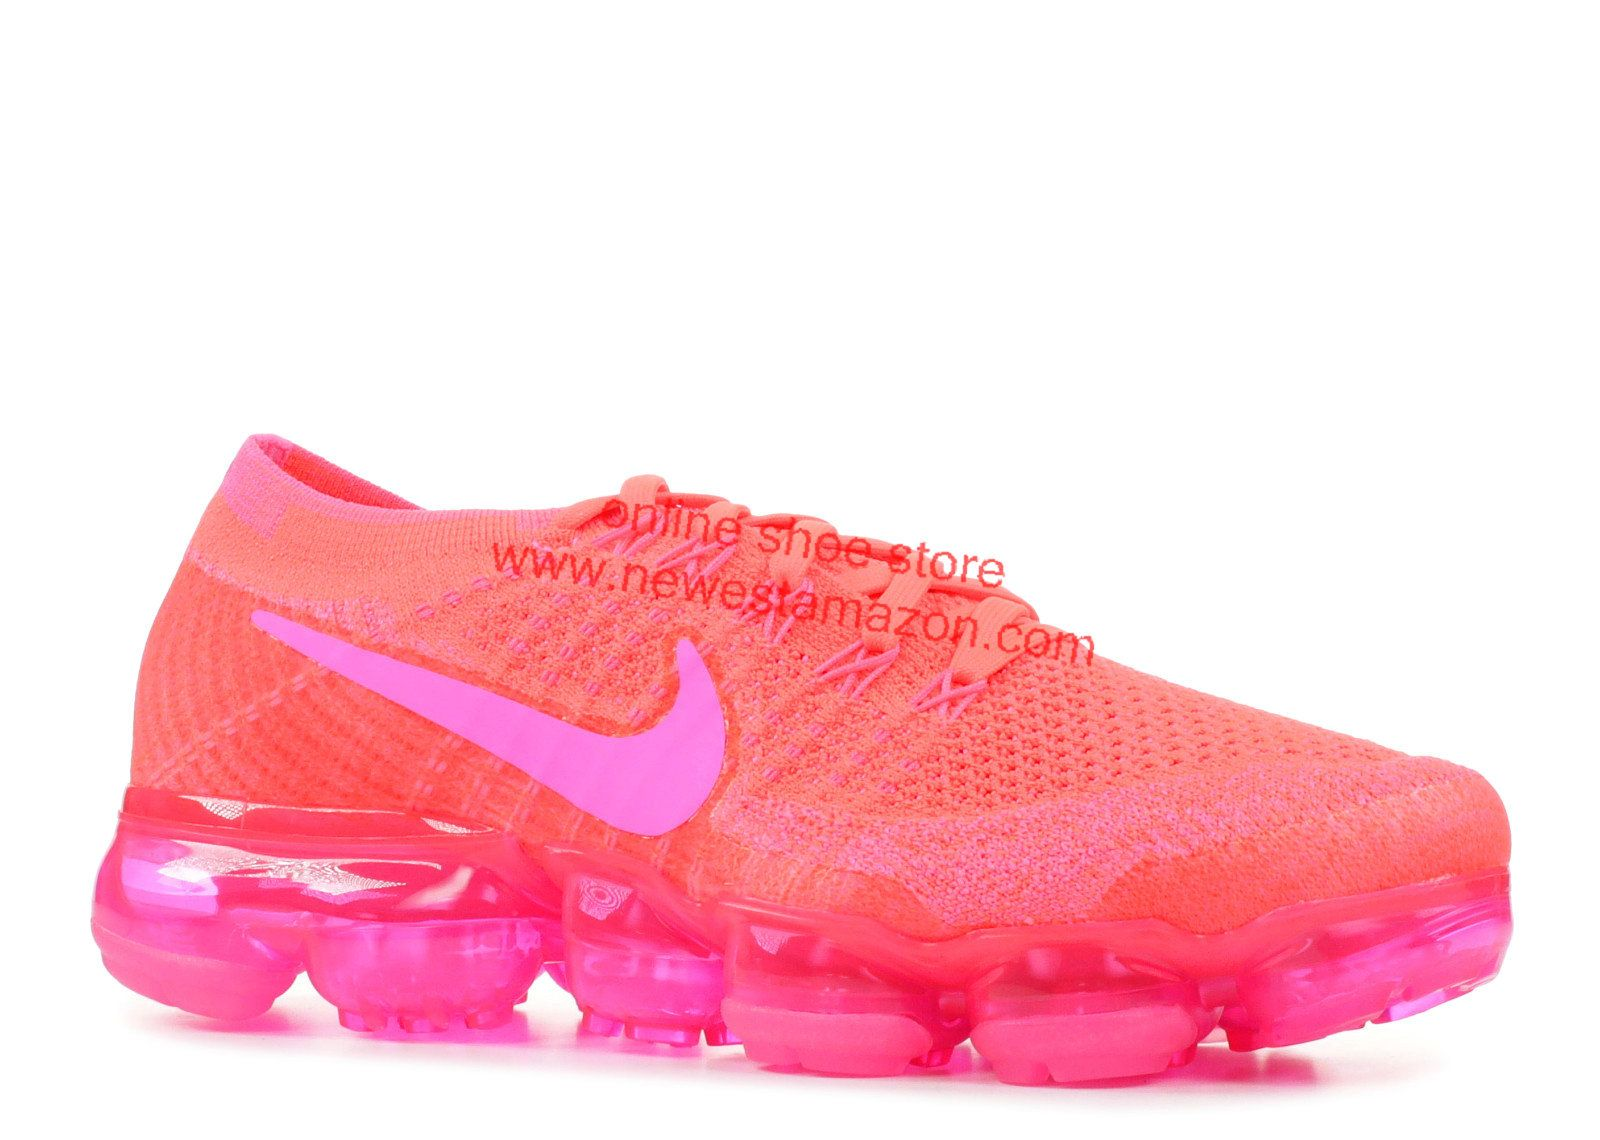 27da49f60394 Spring Summer 2018 Popular Nike Air Vapormax Flyknit Hyper Punch Pink Blast  849557 604 Sneaker